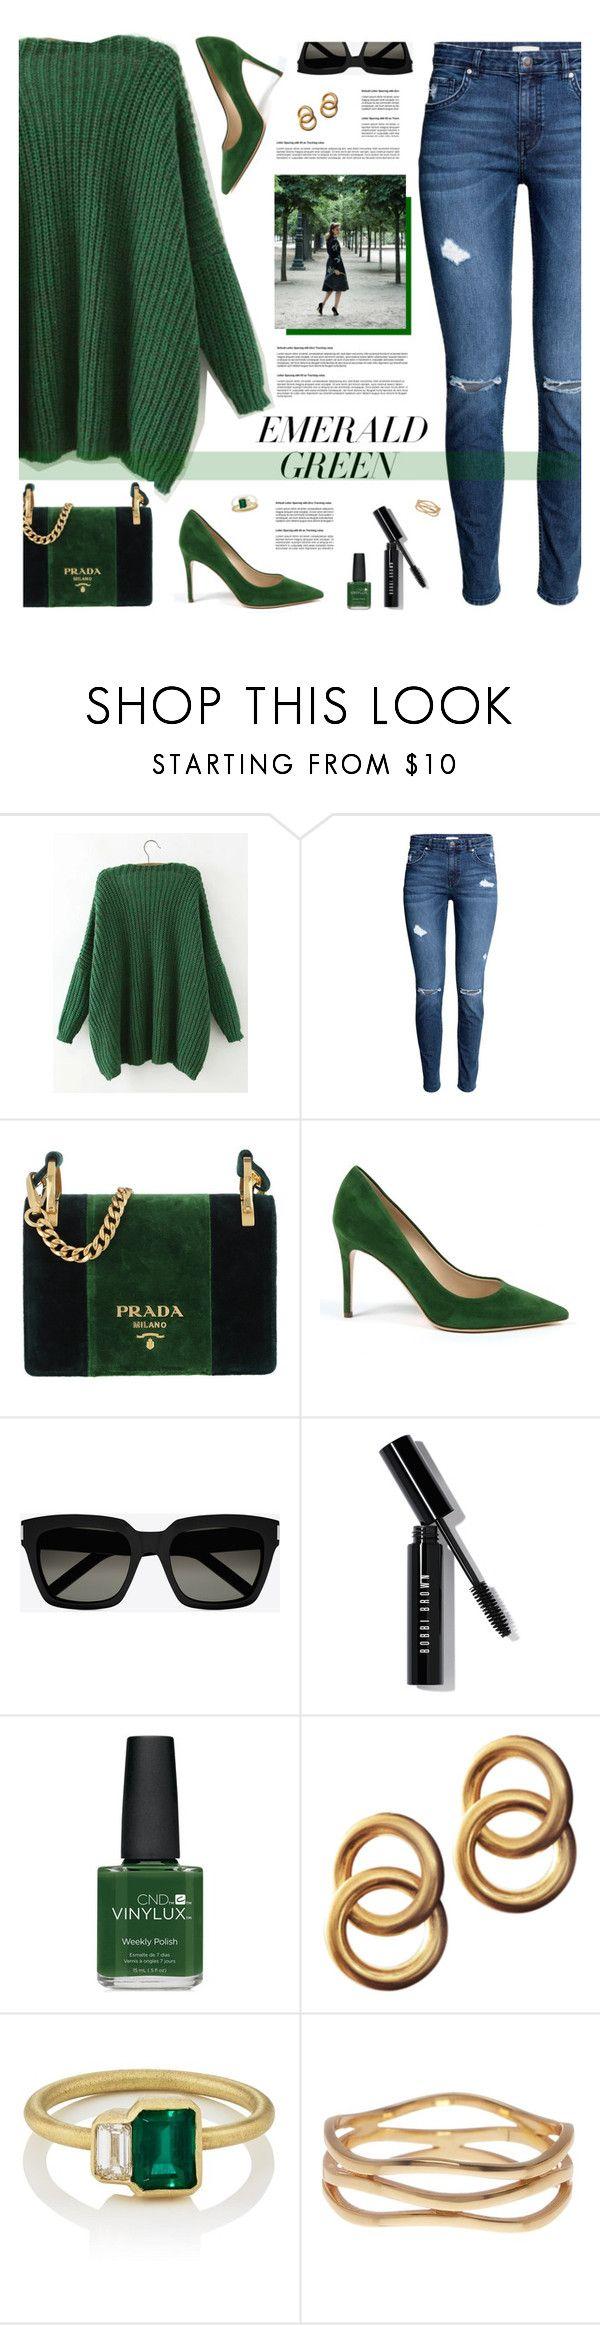 Green Fashion, Fashion outfits, Polyvore